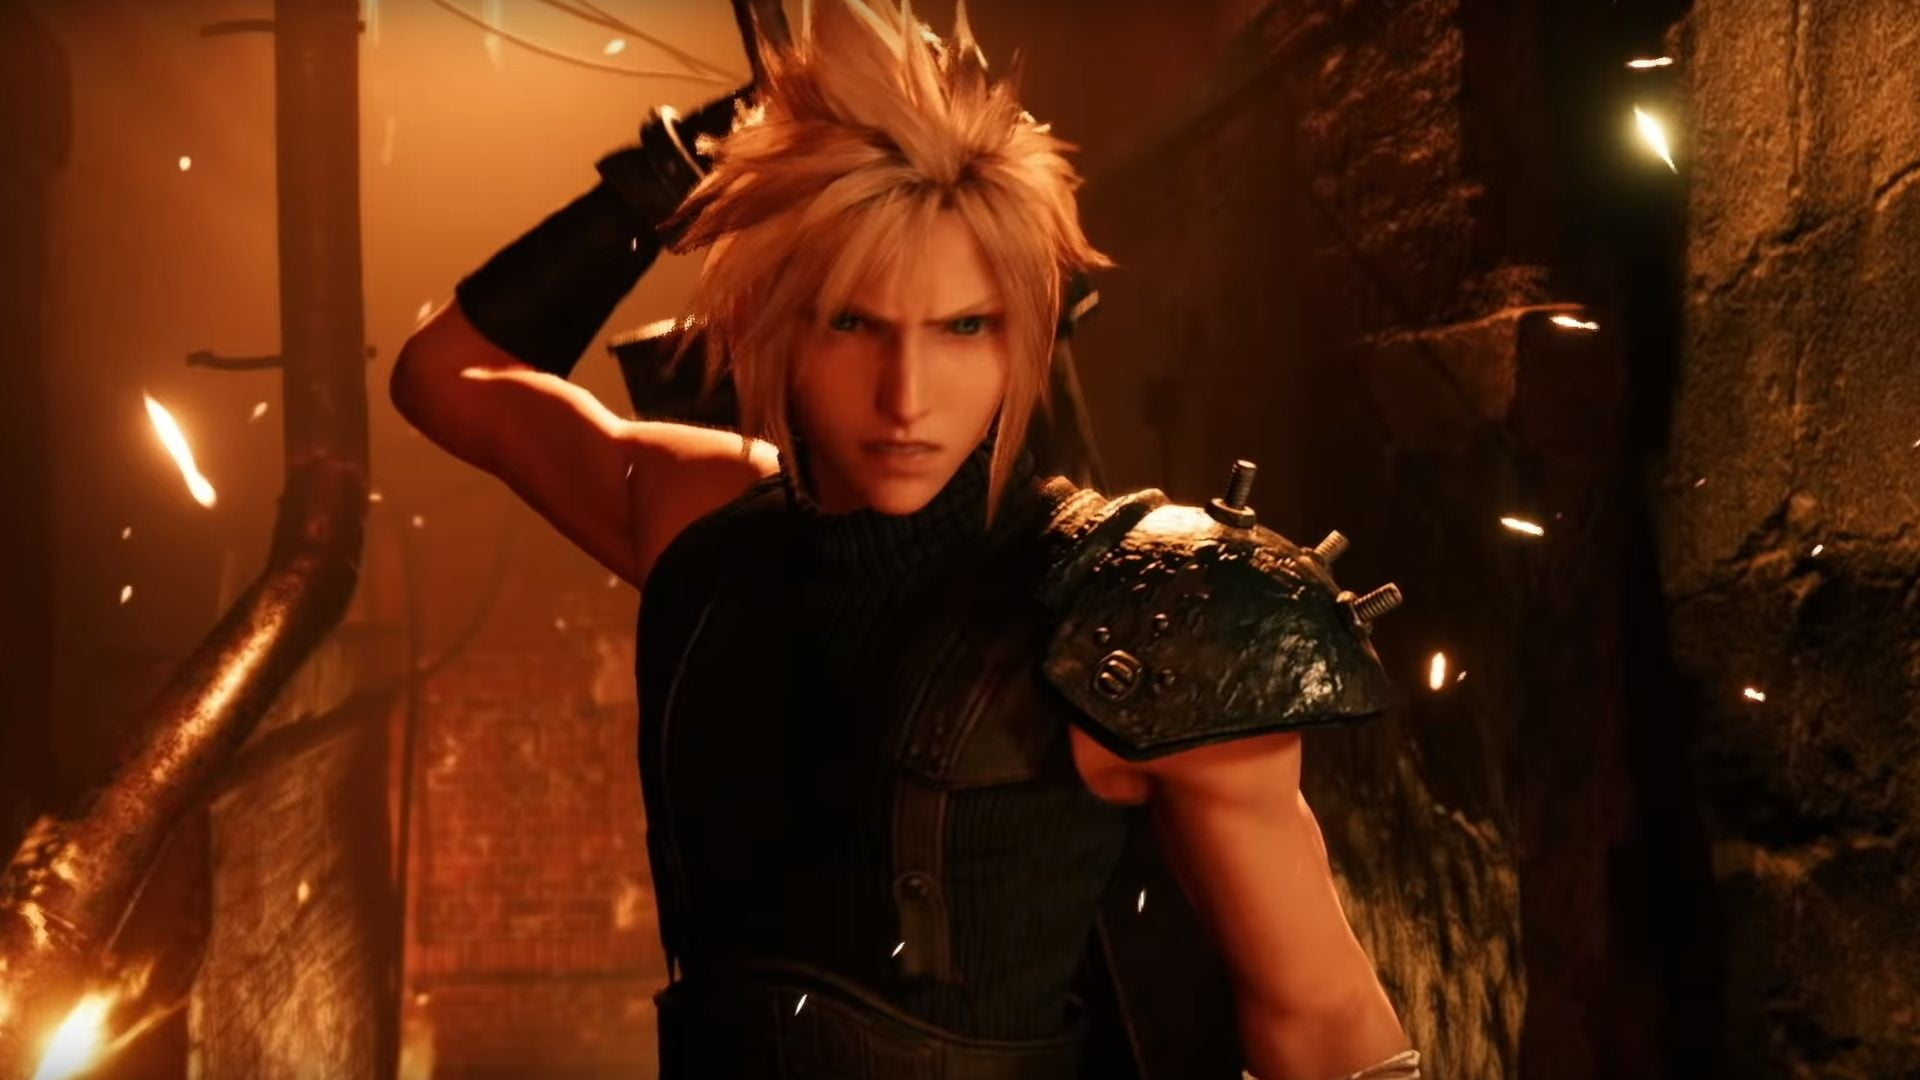 Final Fantasy 7 Remake - HD Wallpaper